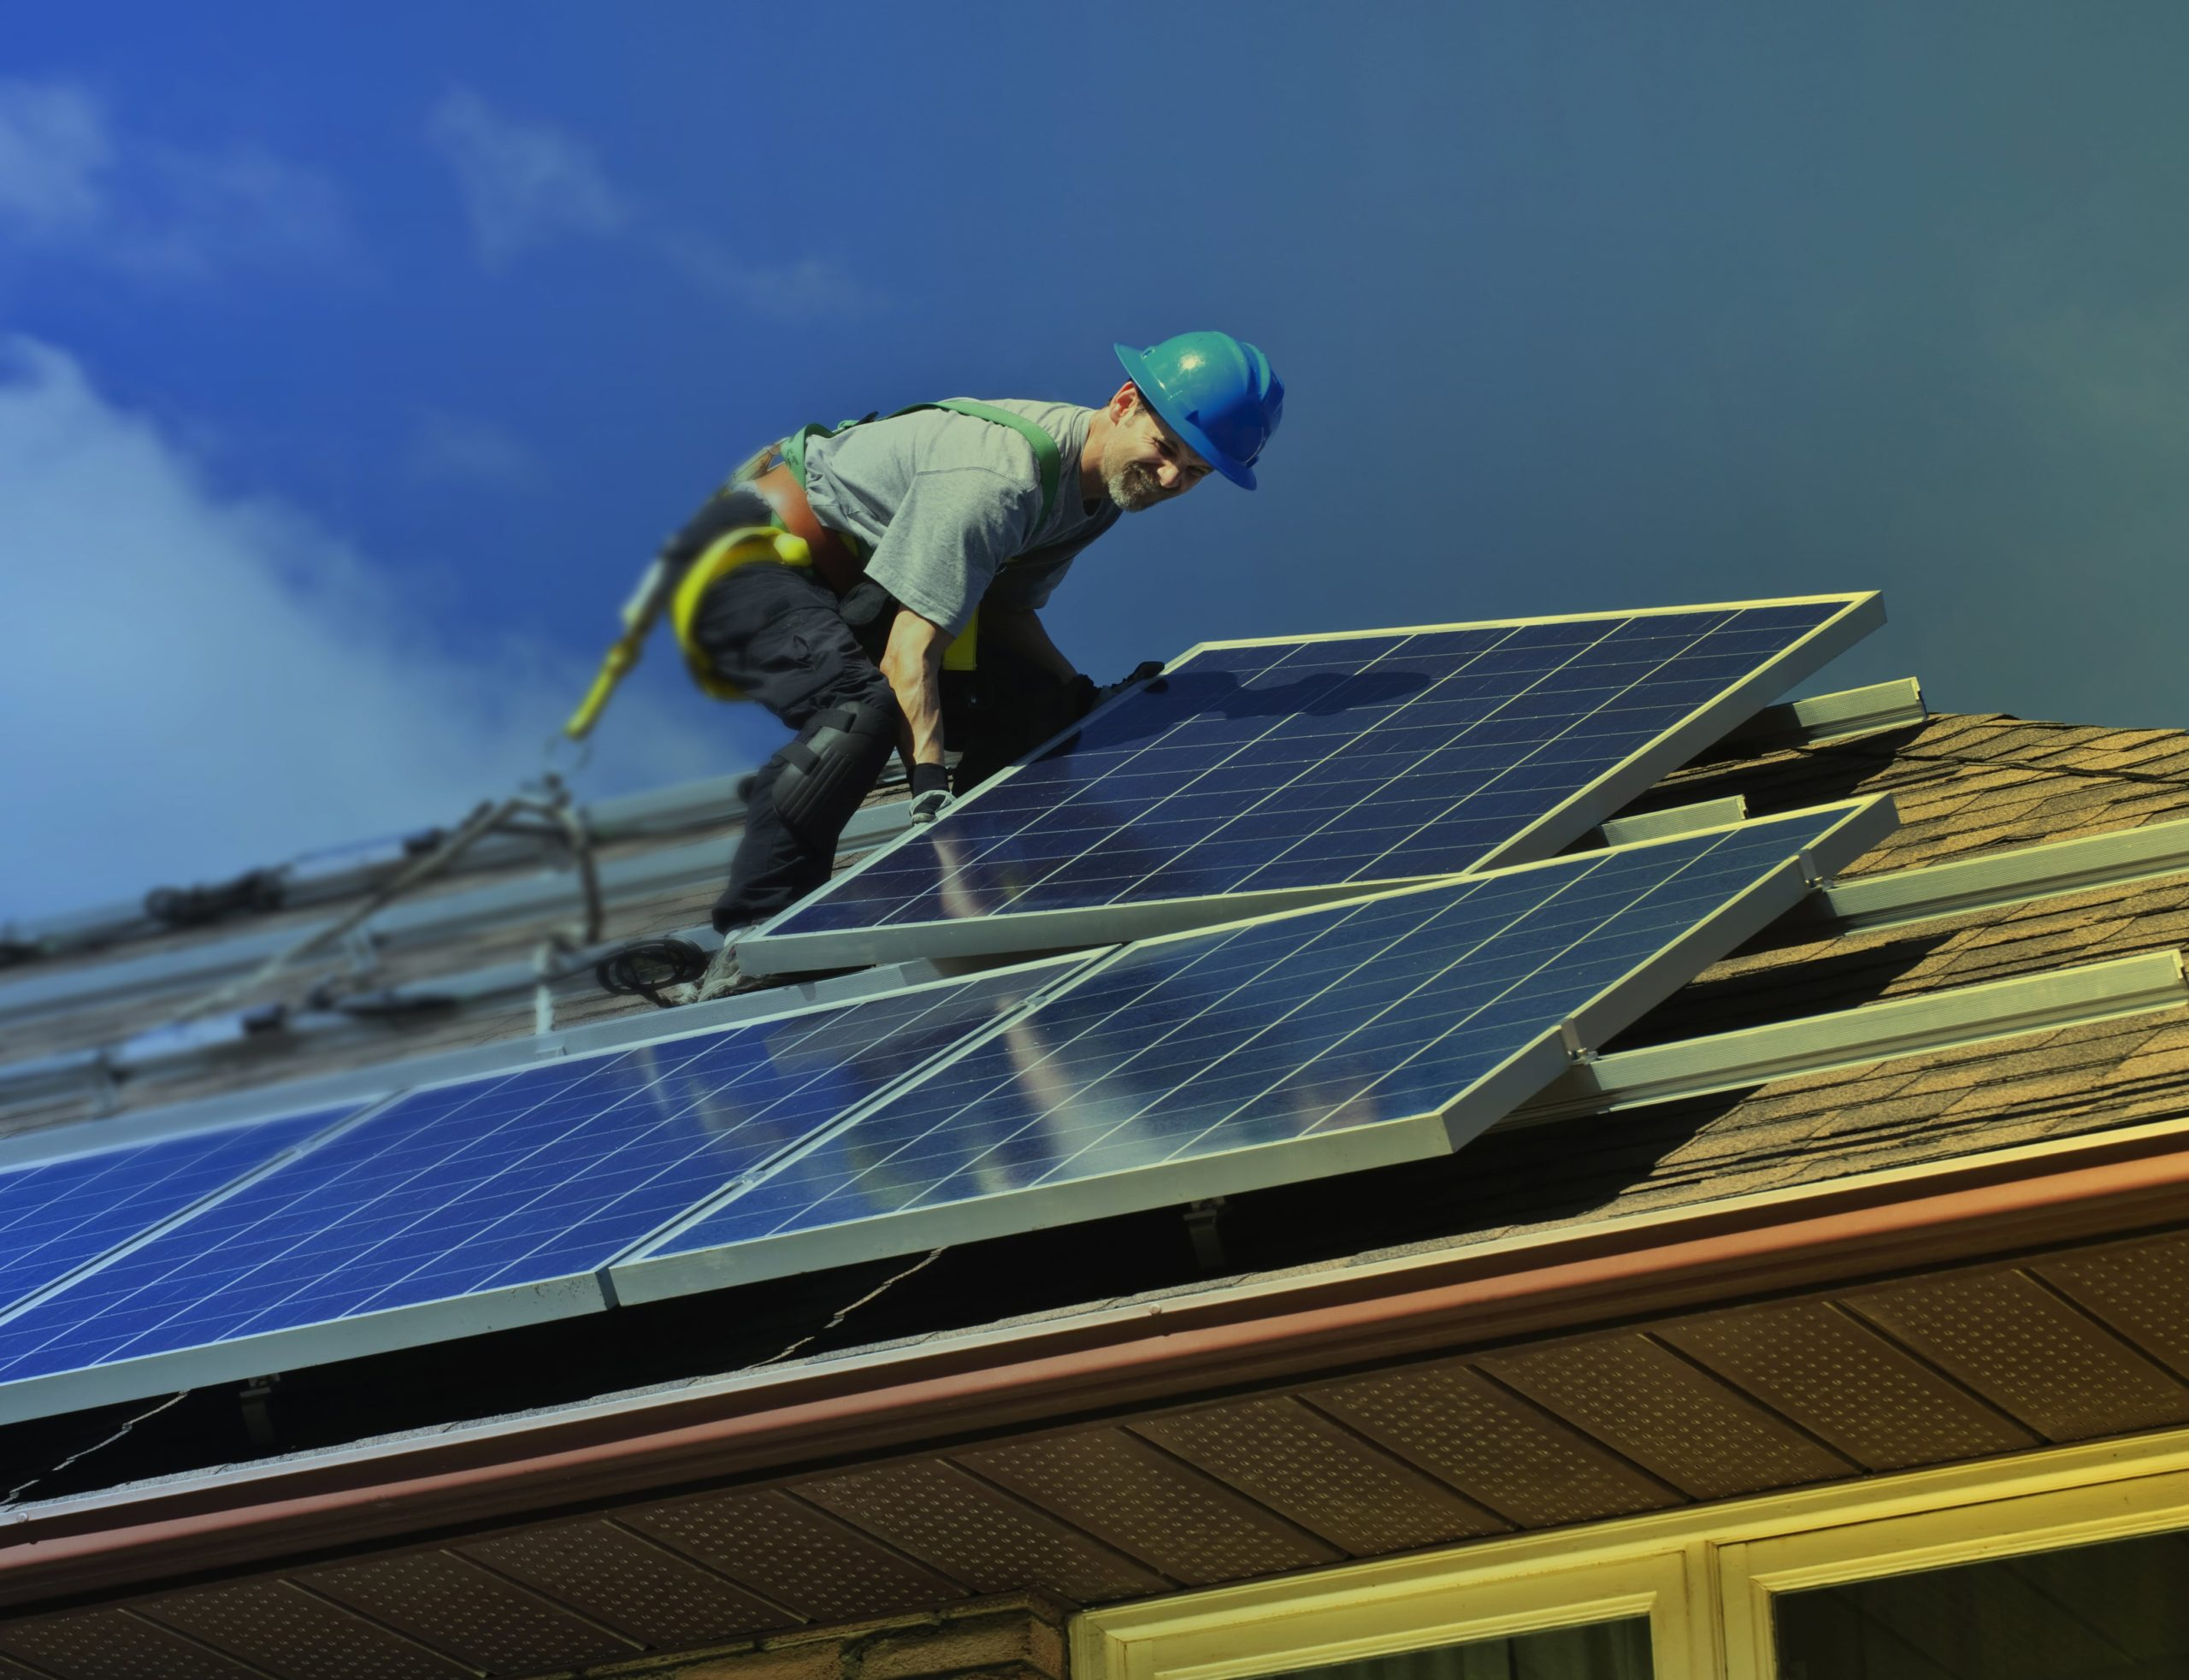 Energia-solar-fotovoltaica-Taurus-instalacion-min-scaled.jpg